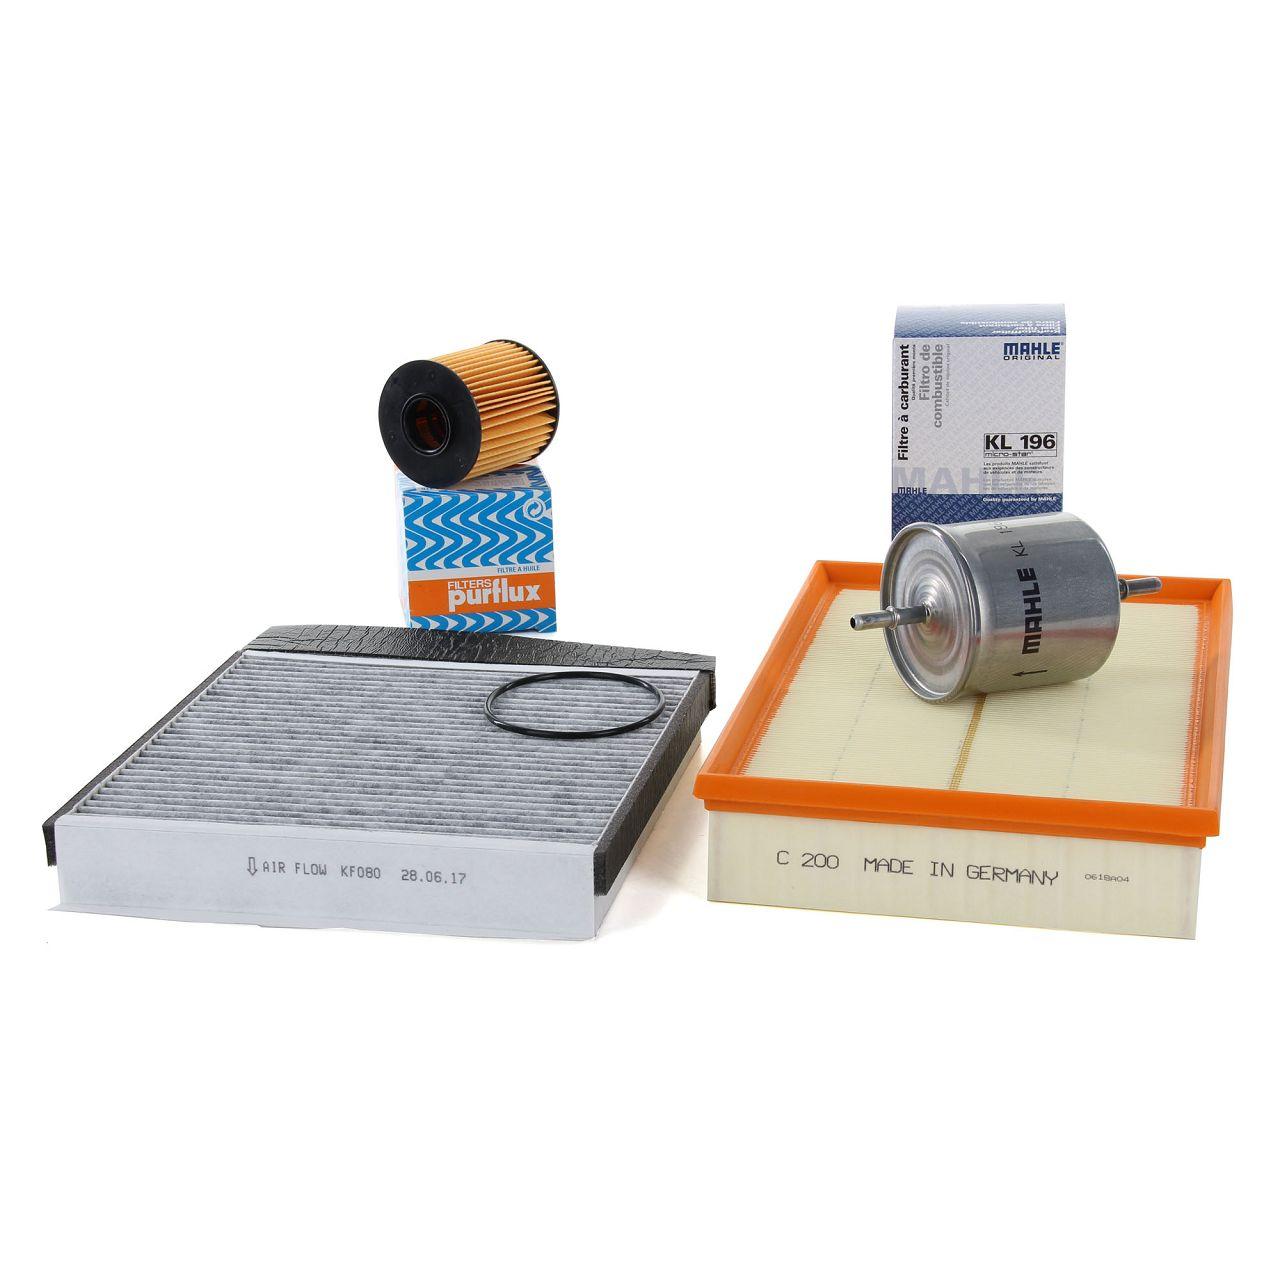 Inspektionskit für VOLVO S60 I S80 I V70 II XC70 CROSS COUNTRY 2.0 2.3 2.4 2.5